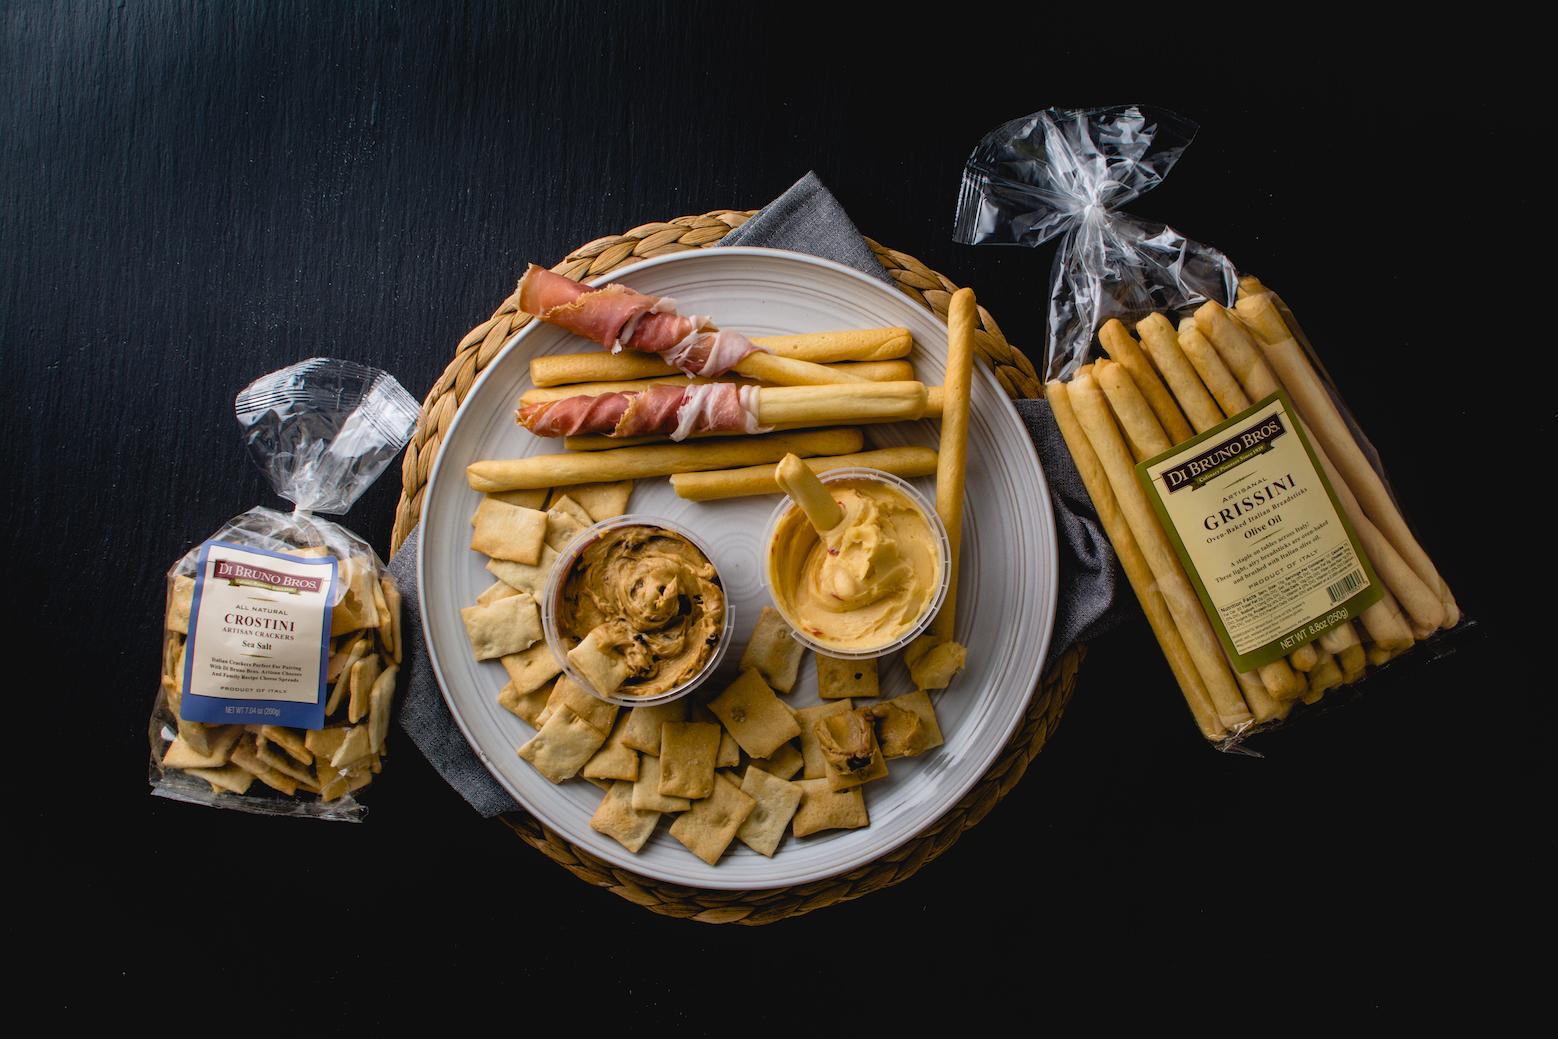 Get Dipping! New Grissini Breadsticks & Sea Salt Crostini!   Blog